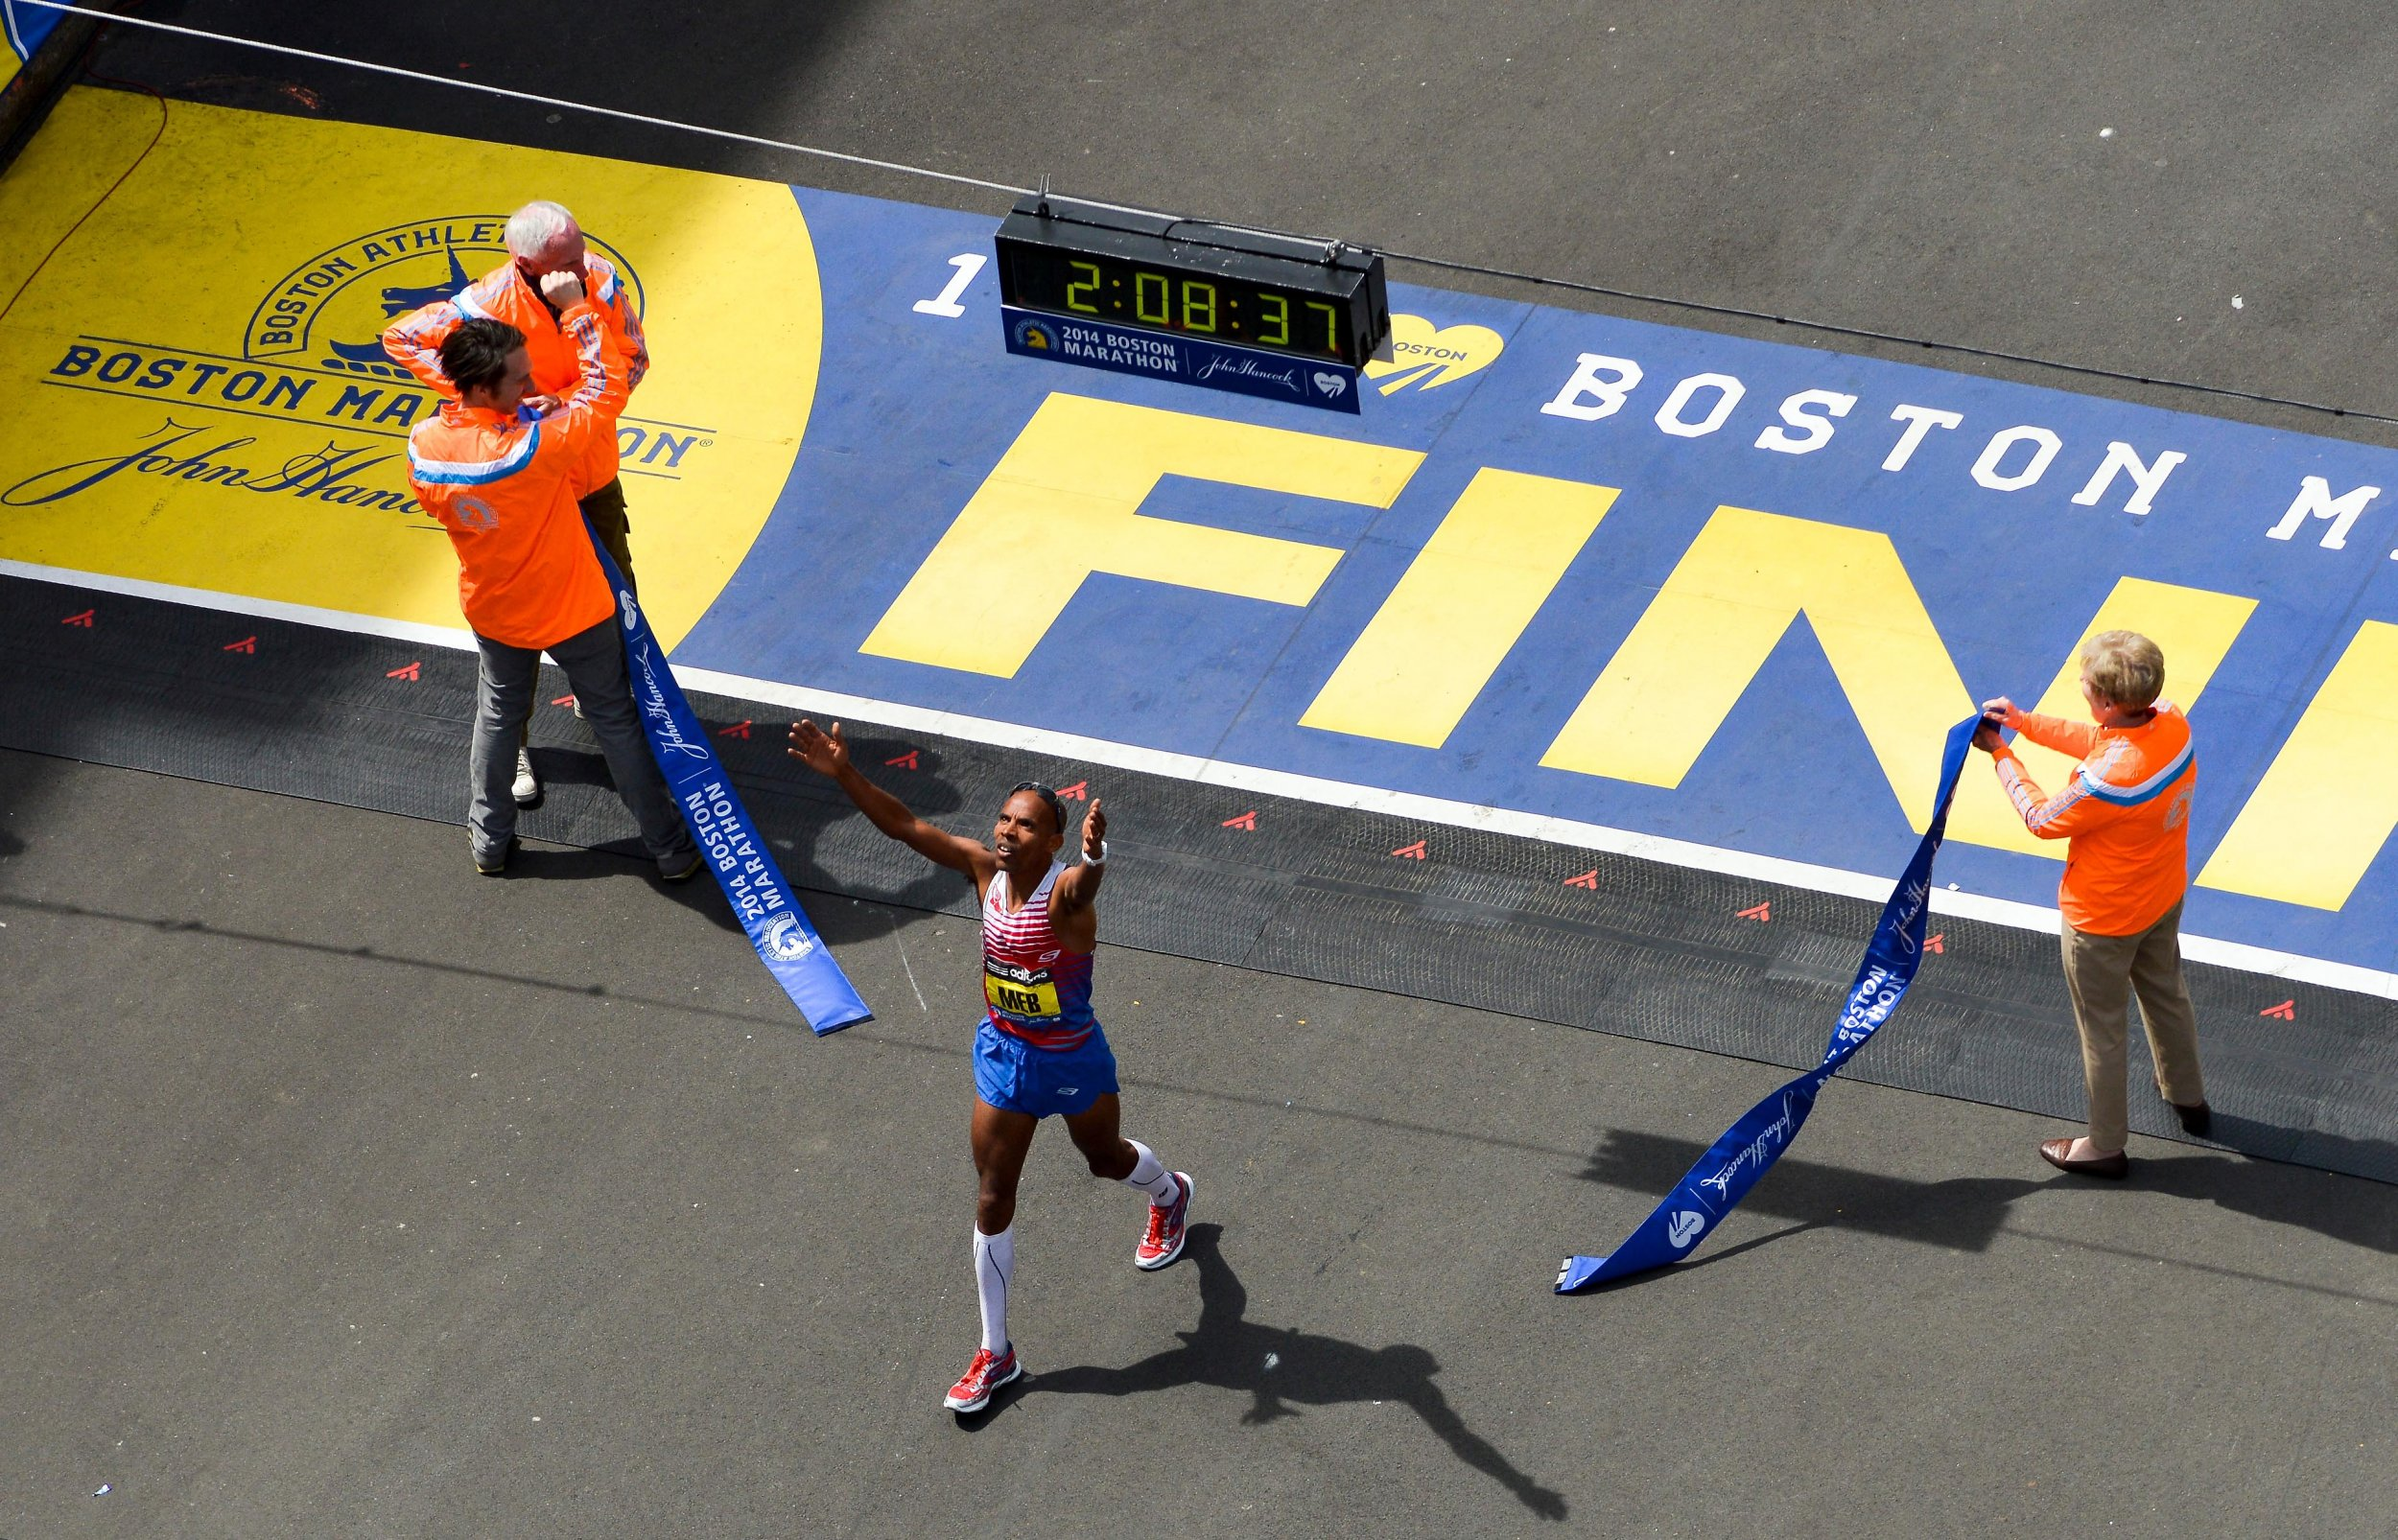 Meb Keflezighi boston marathon